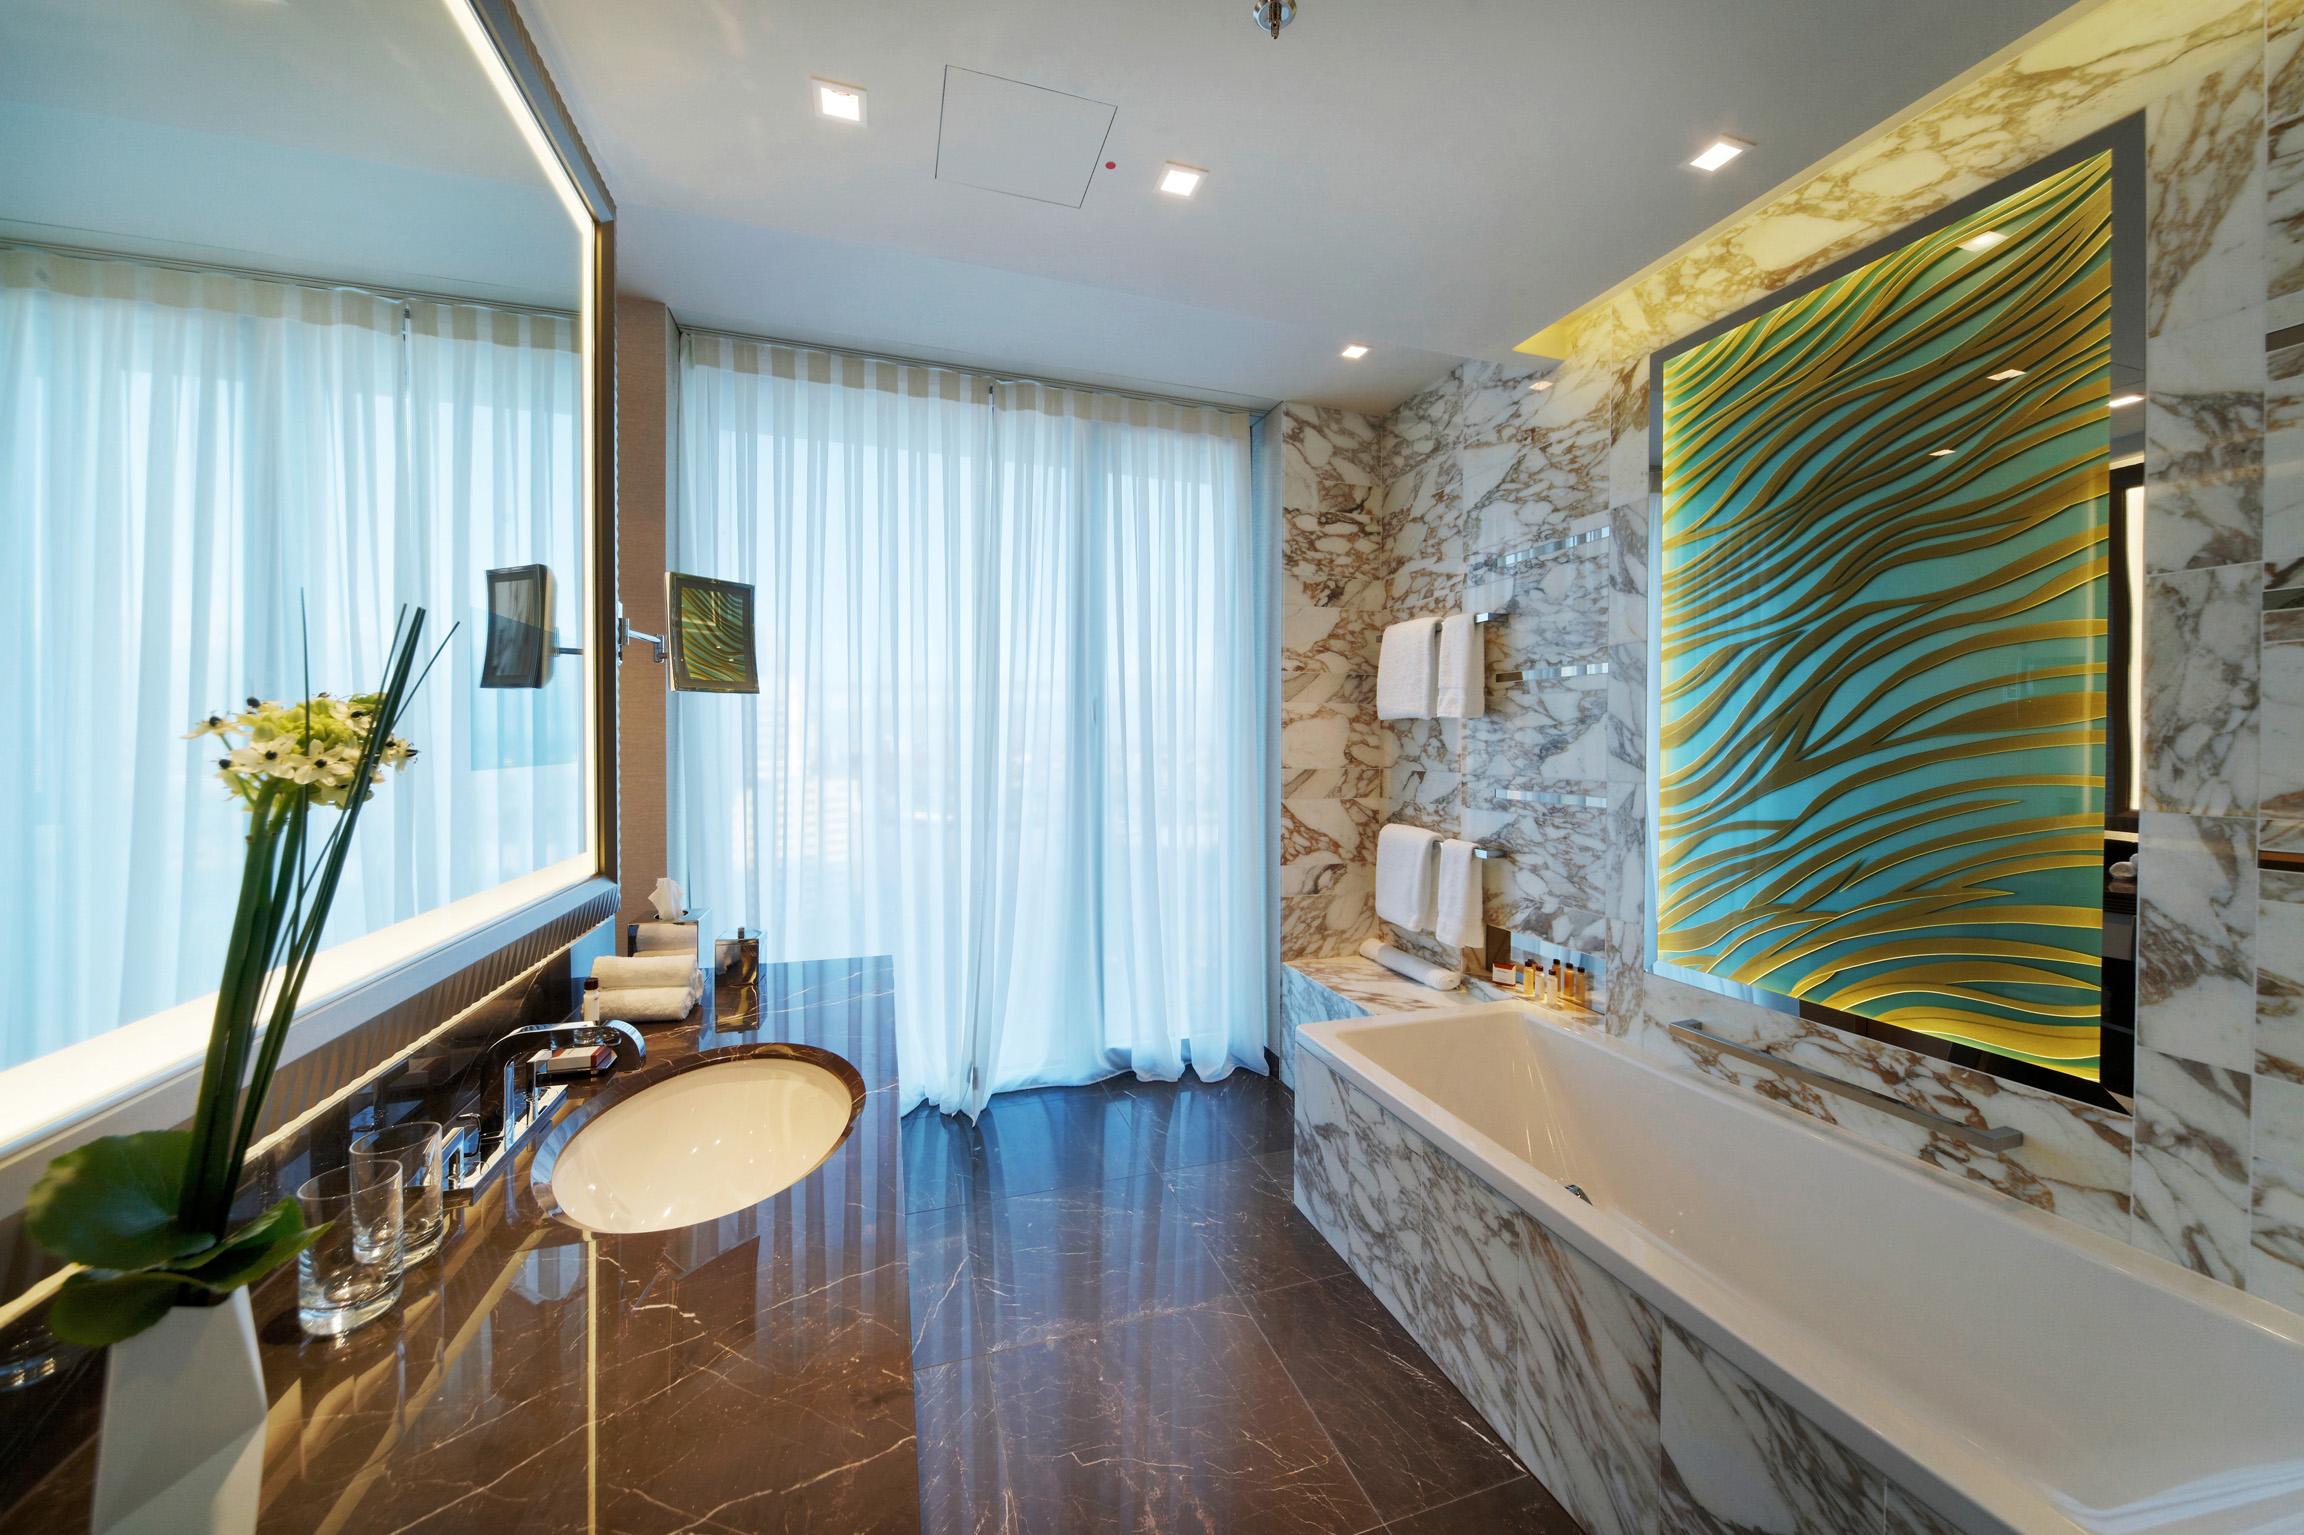 Waldorf astoria style hits berlin for Design hotel waldorf